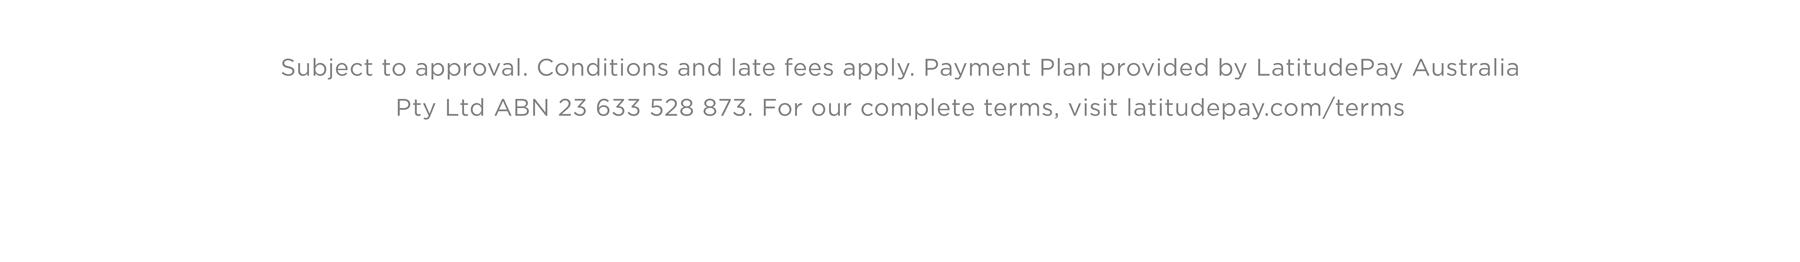 Latitude Pay